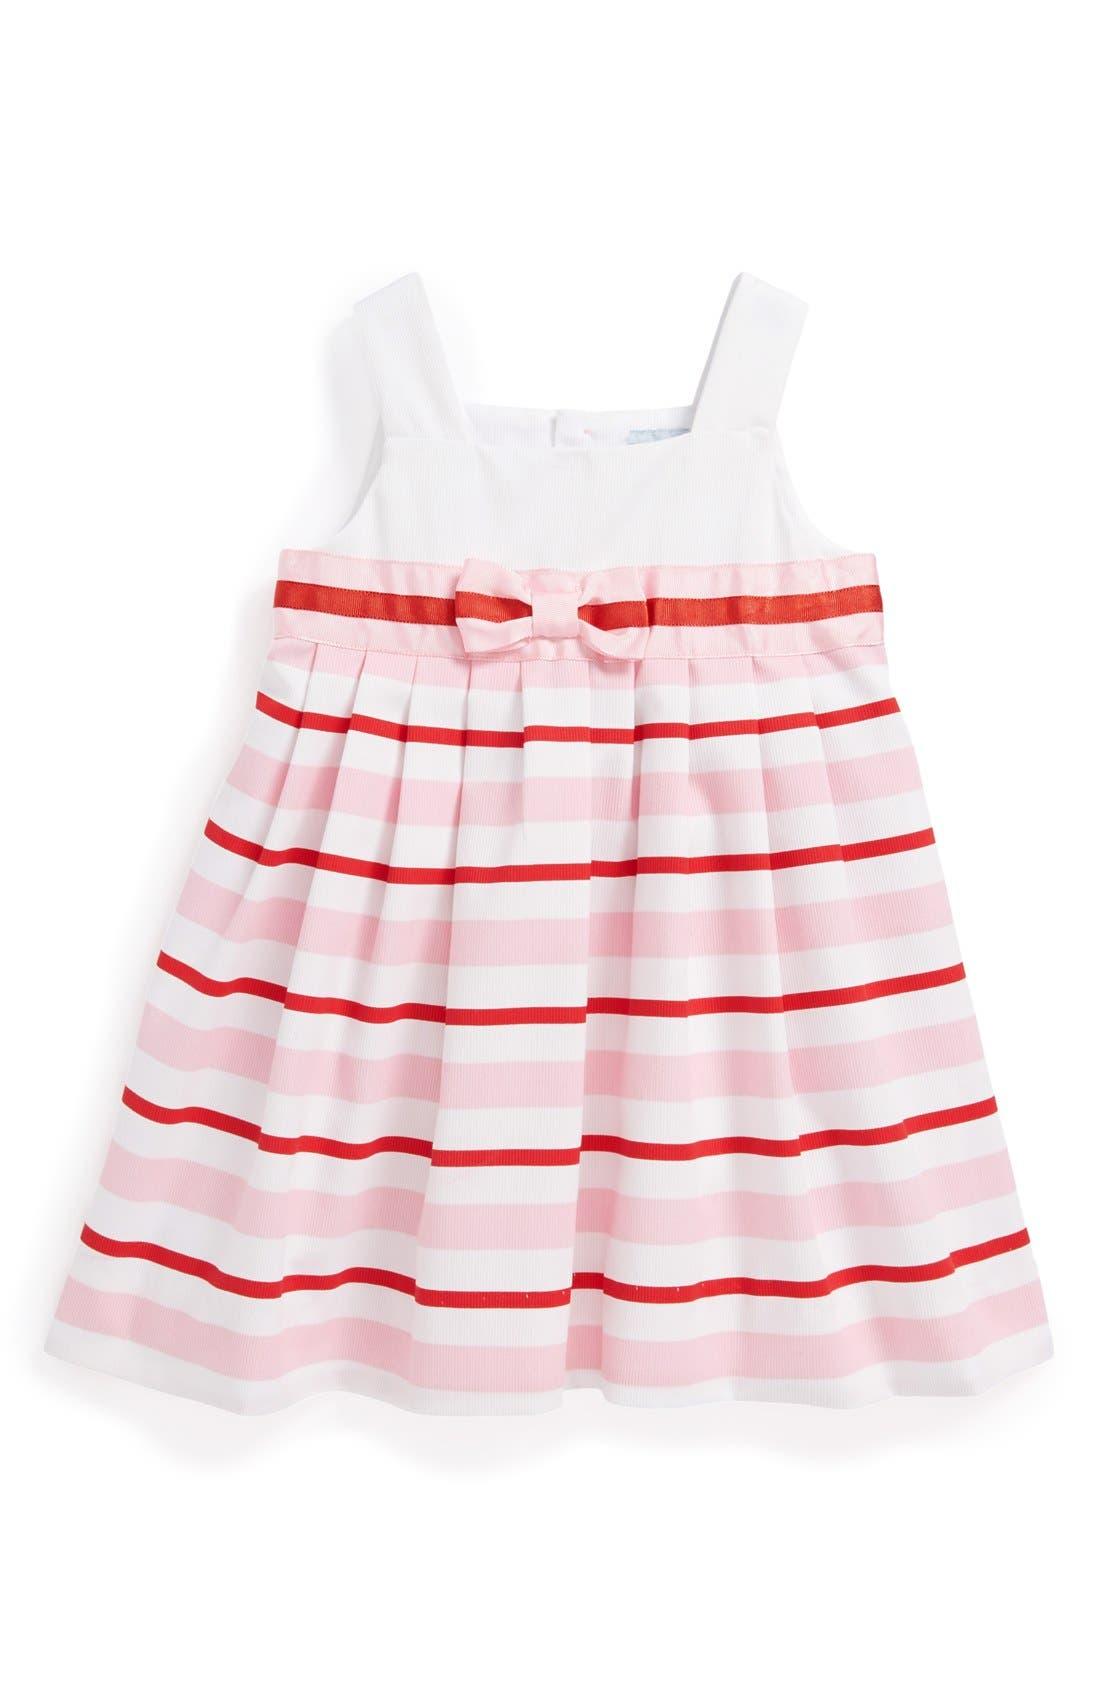 Alternate Image 1 Selected - Luli & Me Nautical Stripe Cotton & Linen A-Line Dress (Baby Girls)